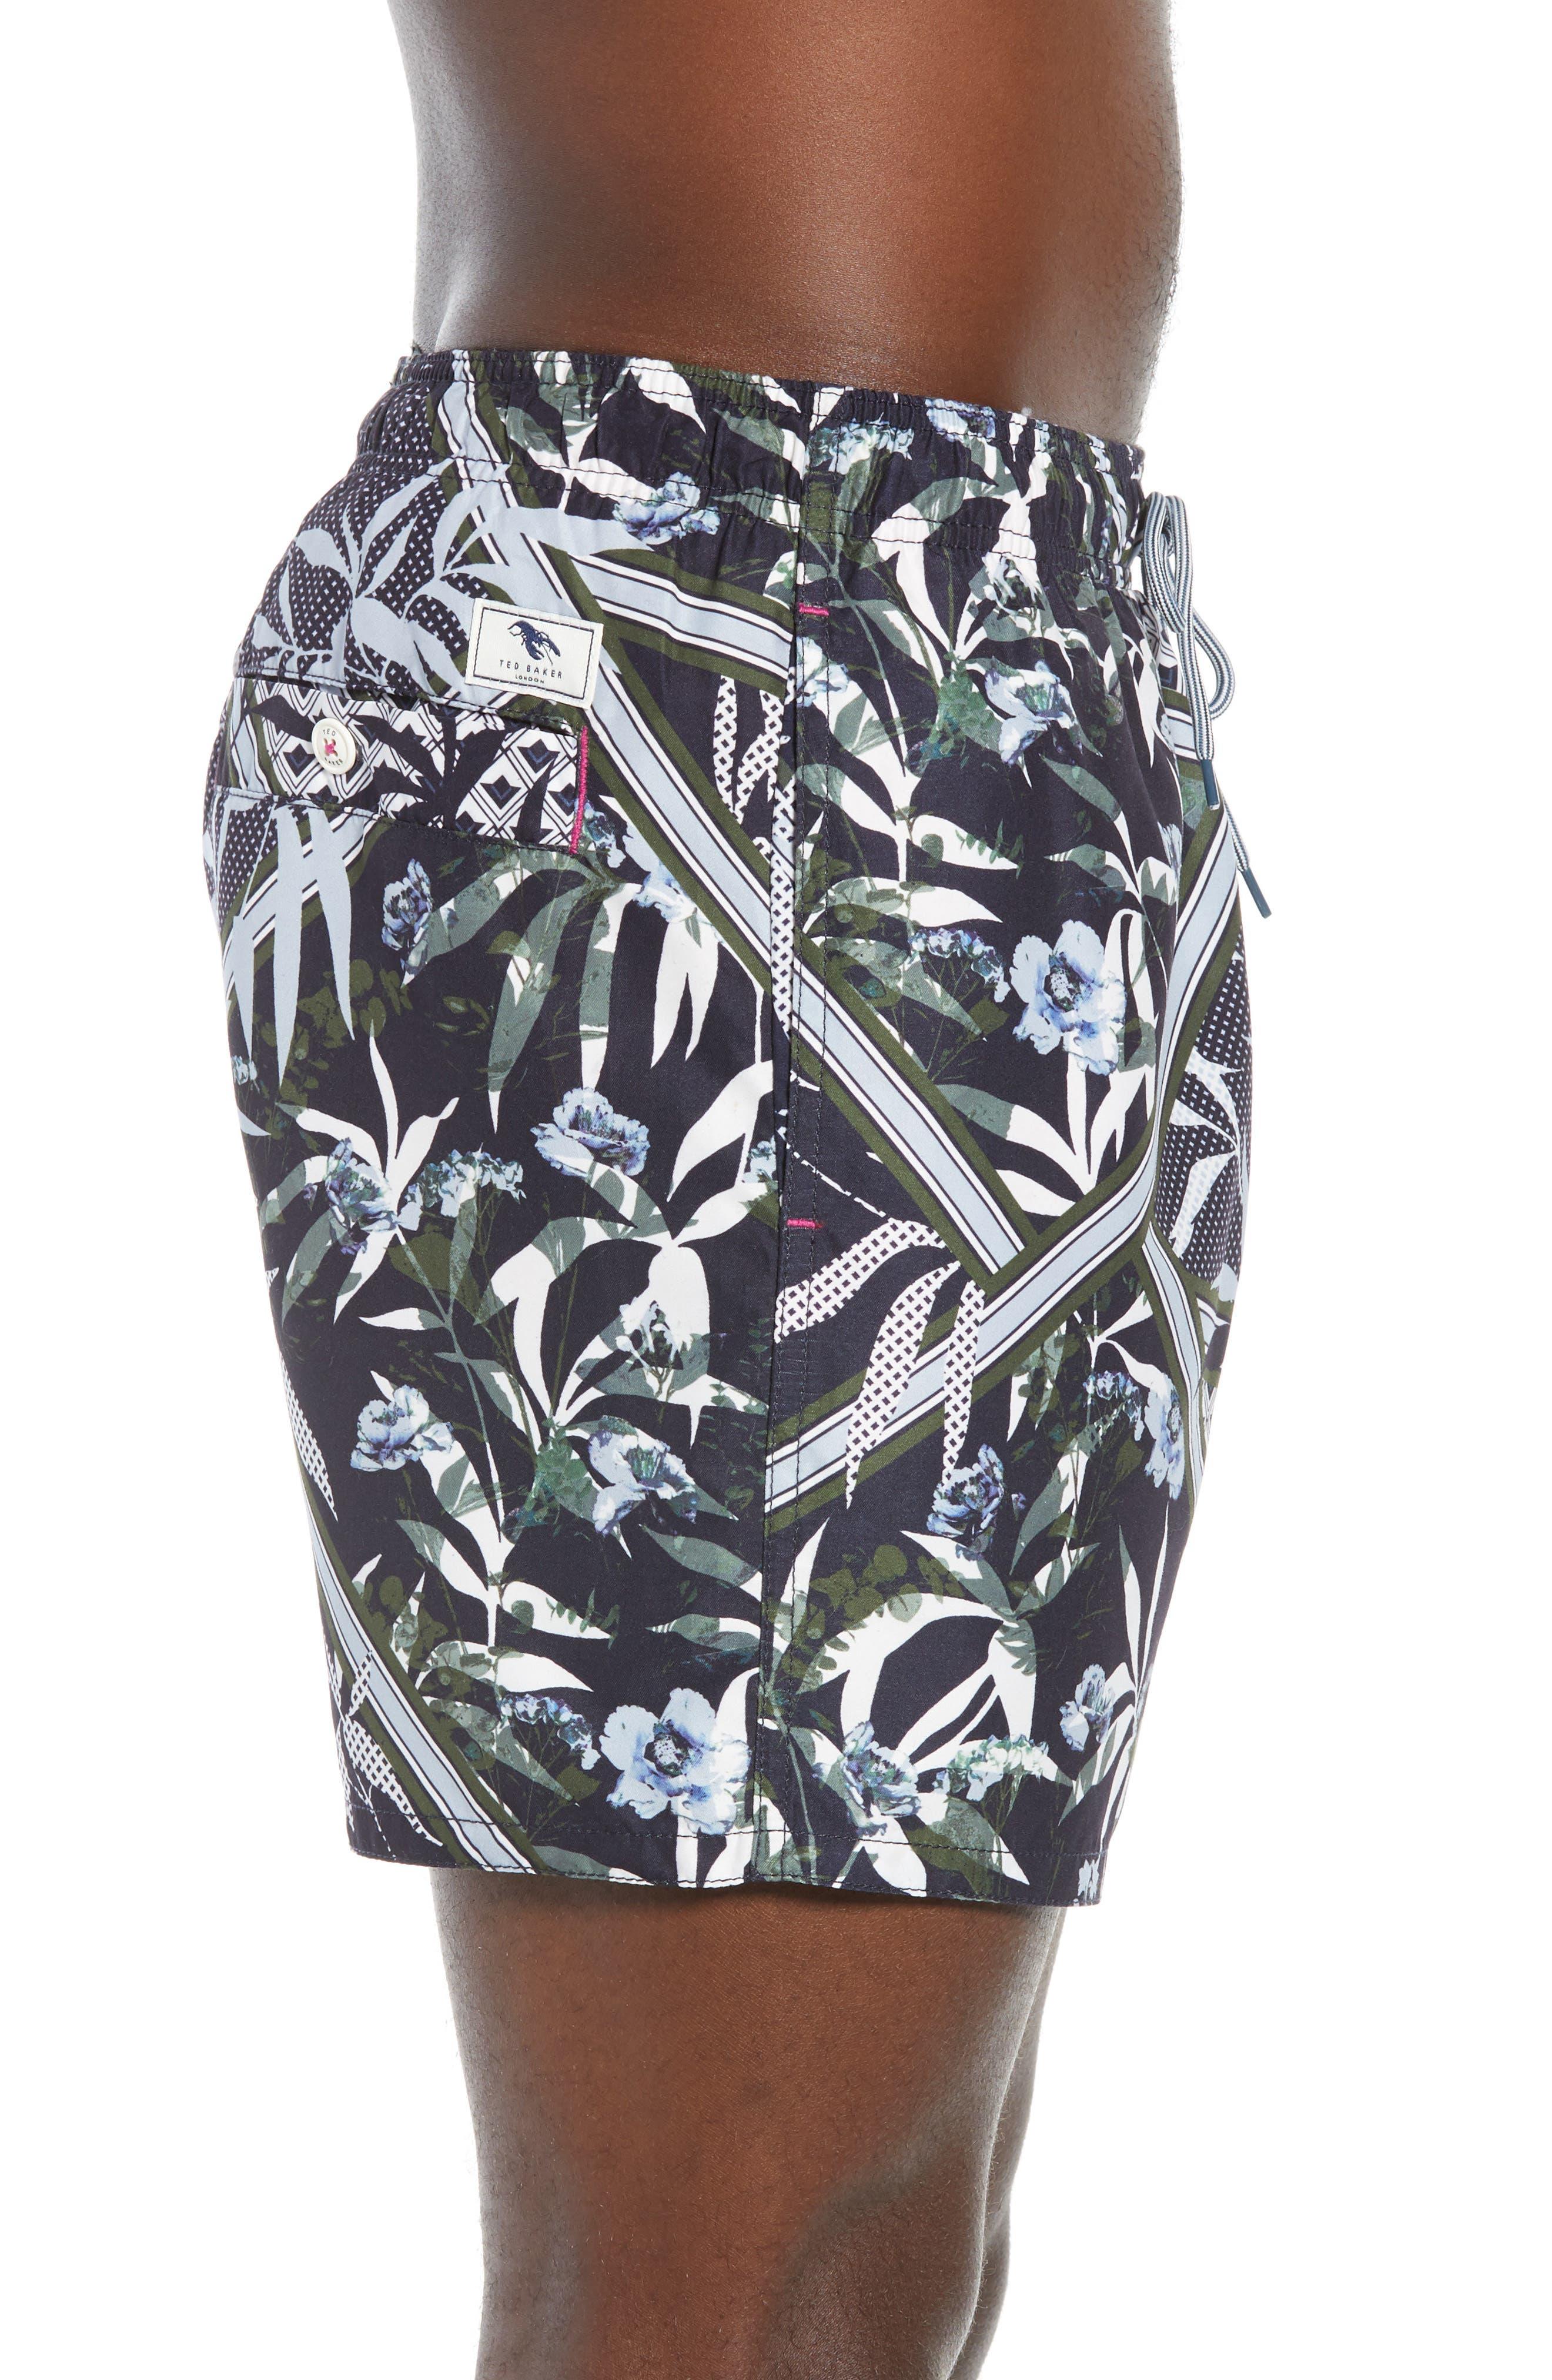 TED BAKER LONDON,                             Plecoe Slim Fit Floral Print Swim Trunks,                             Alternate thumbnail 3, color,                             410